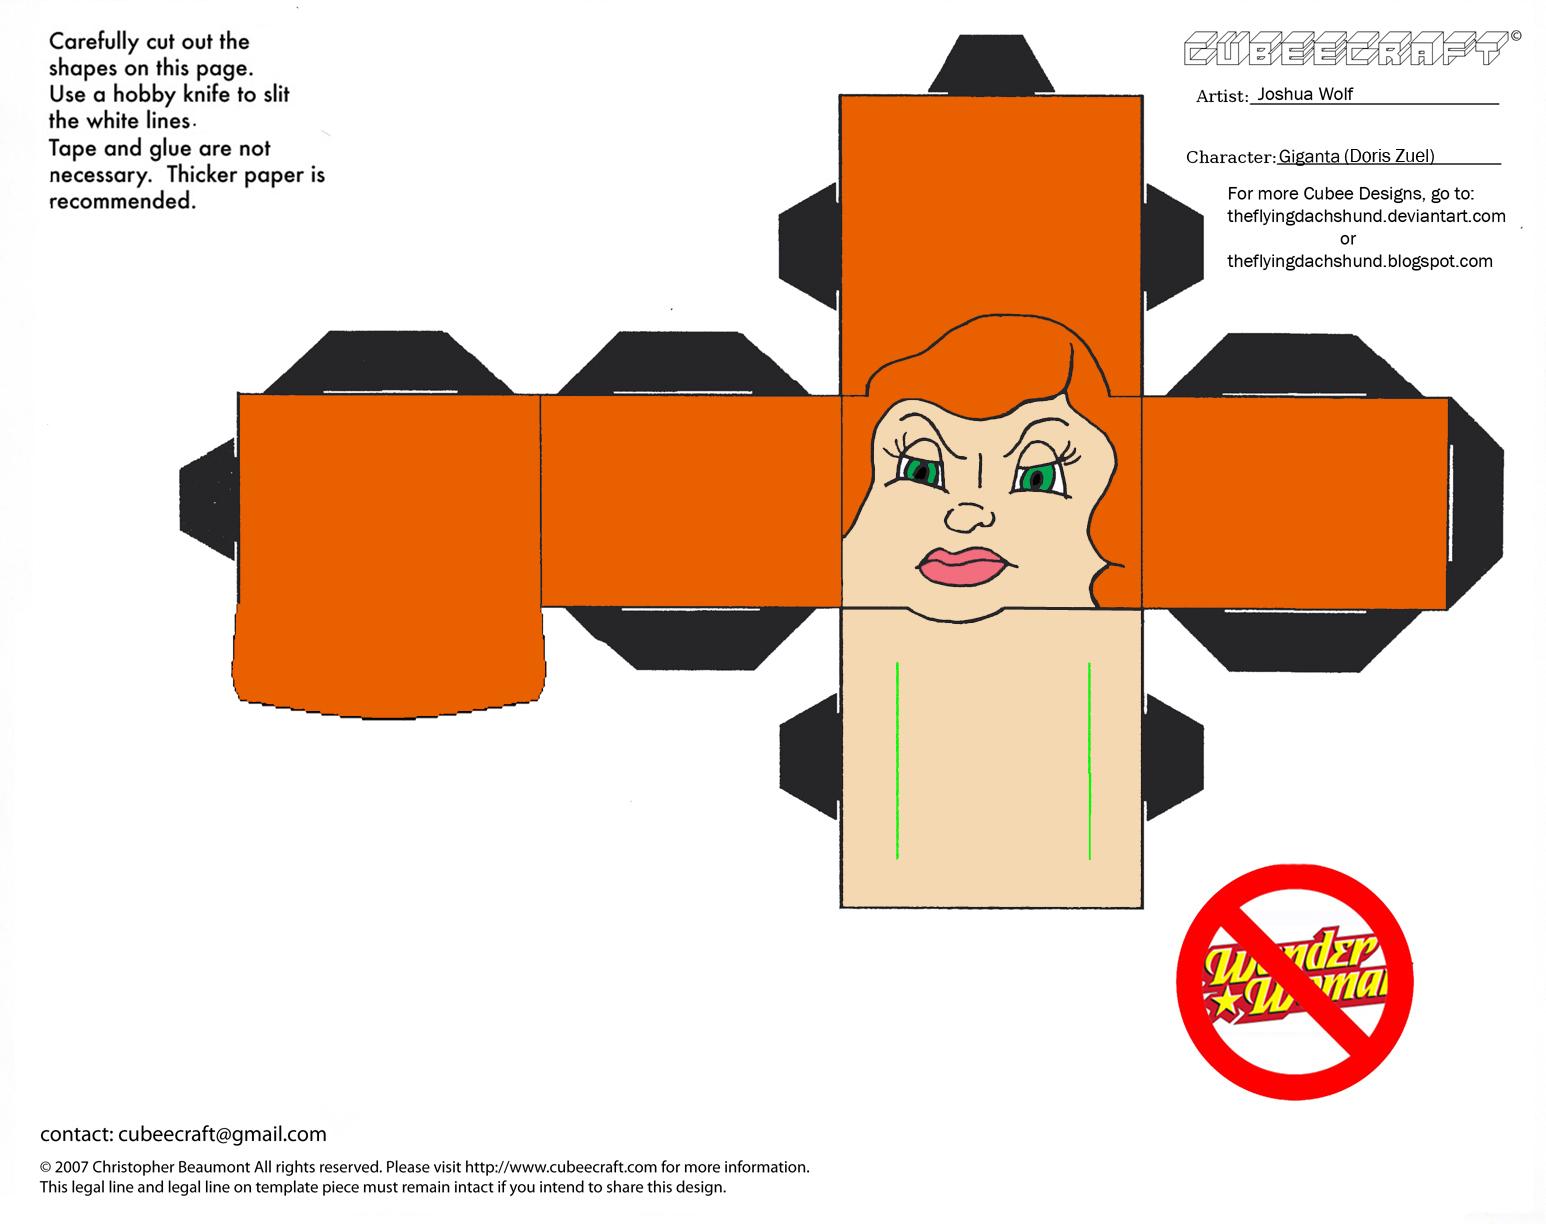 Vil7: Giganta Cubee